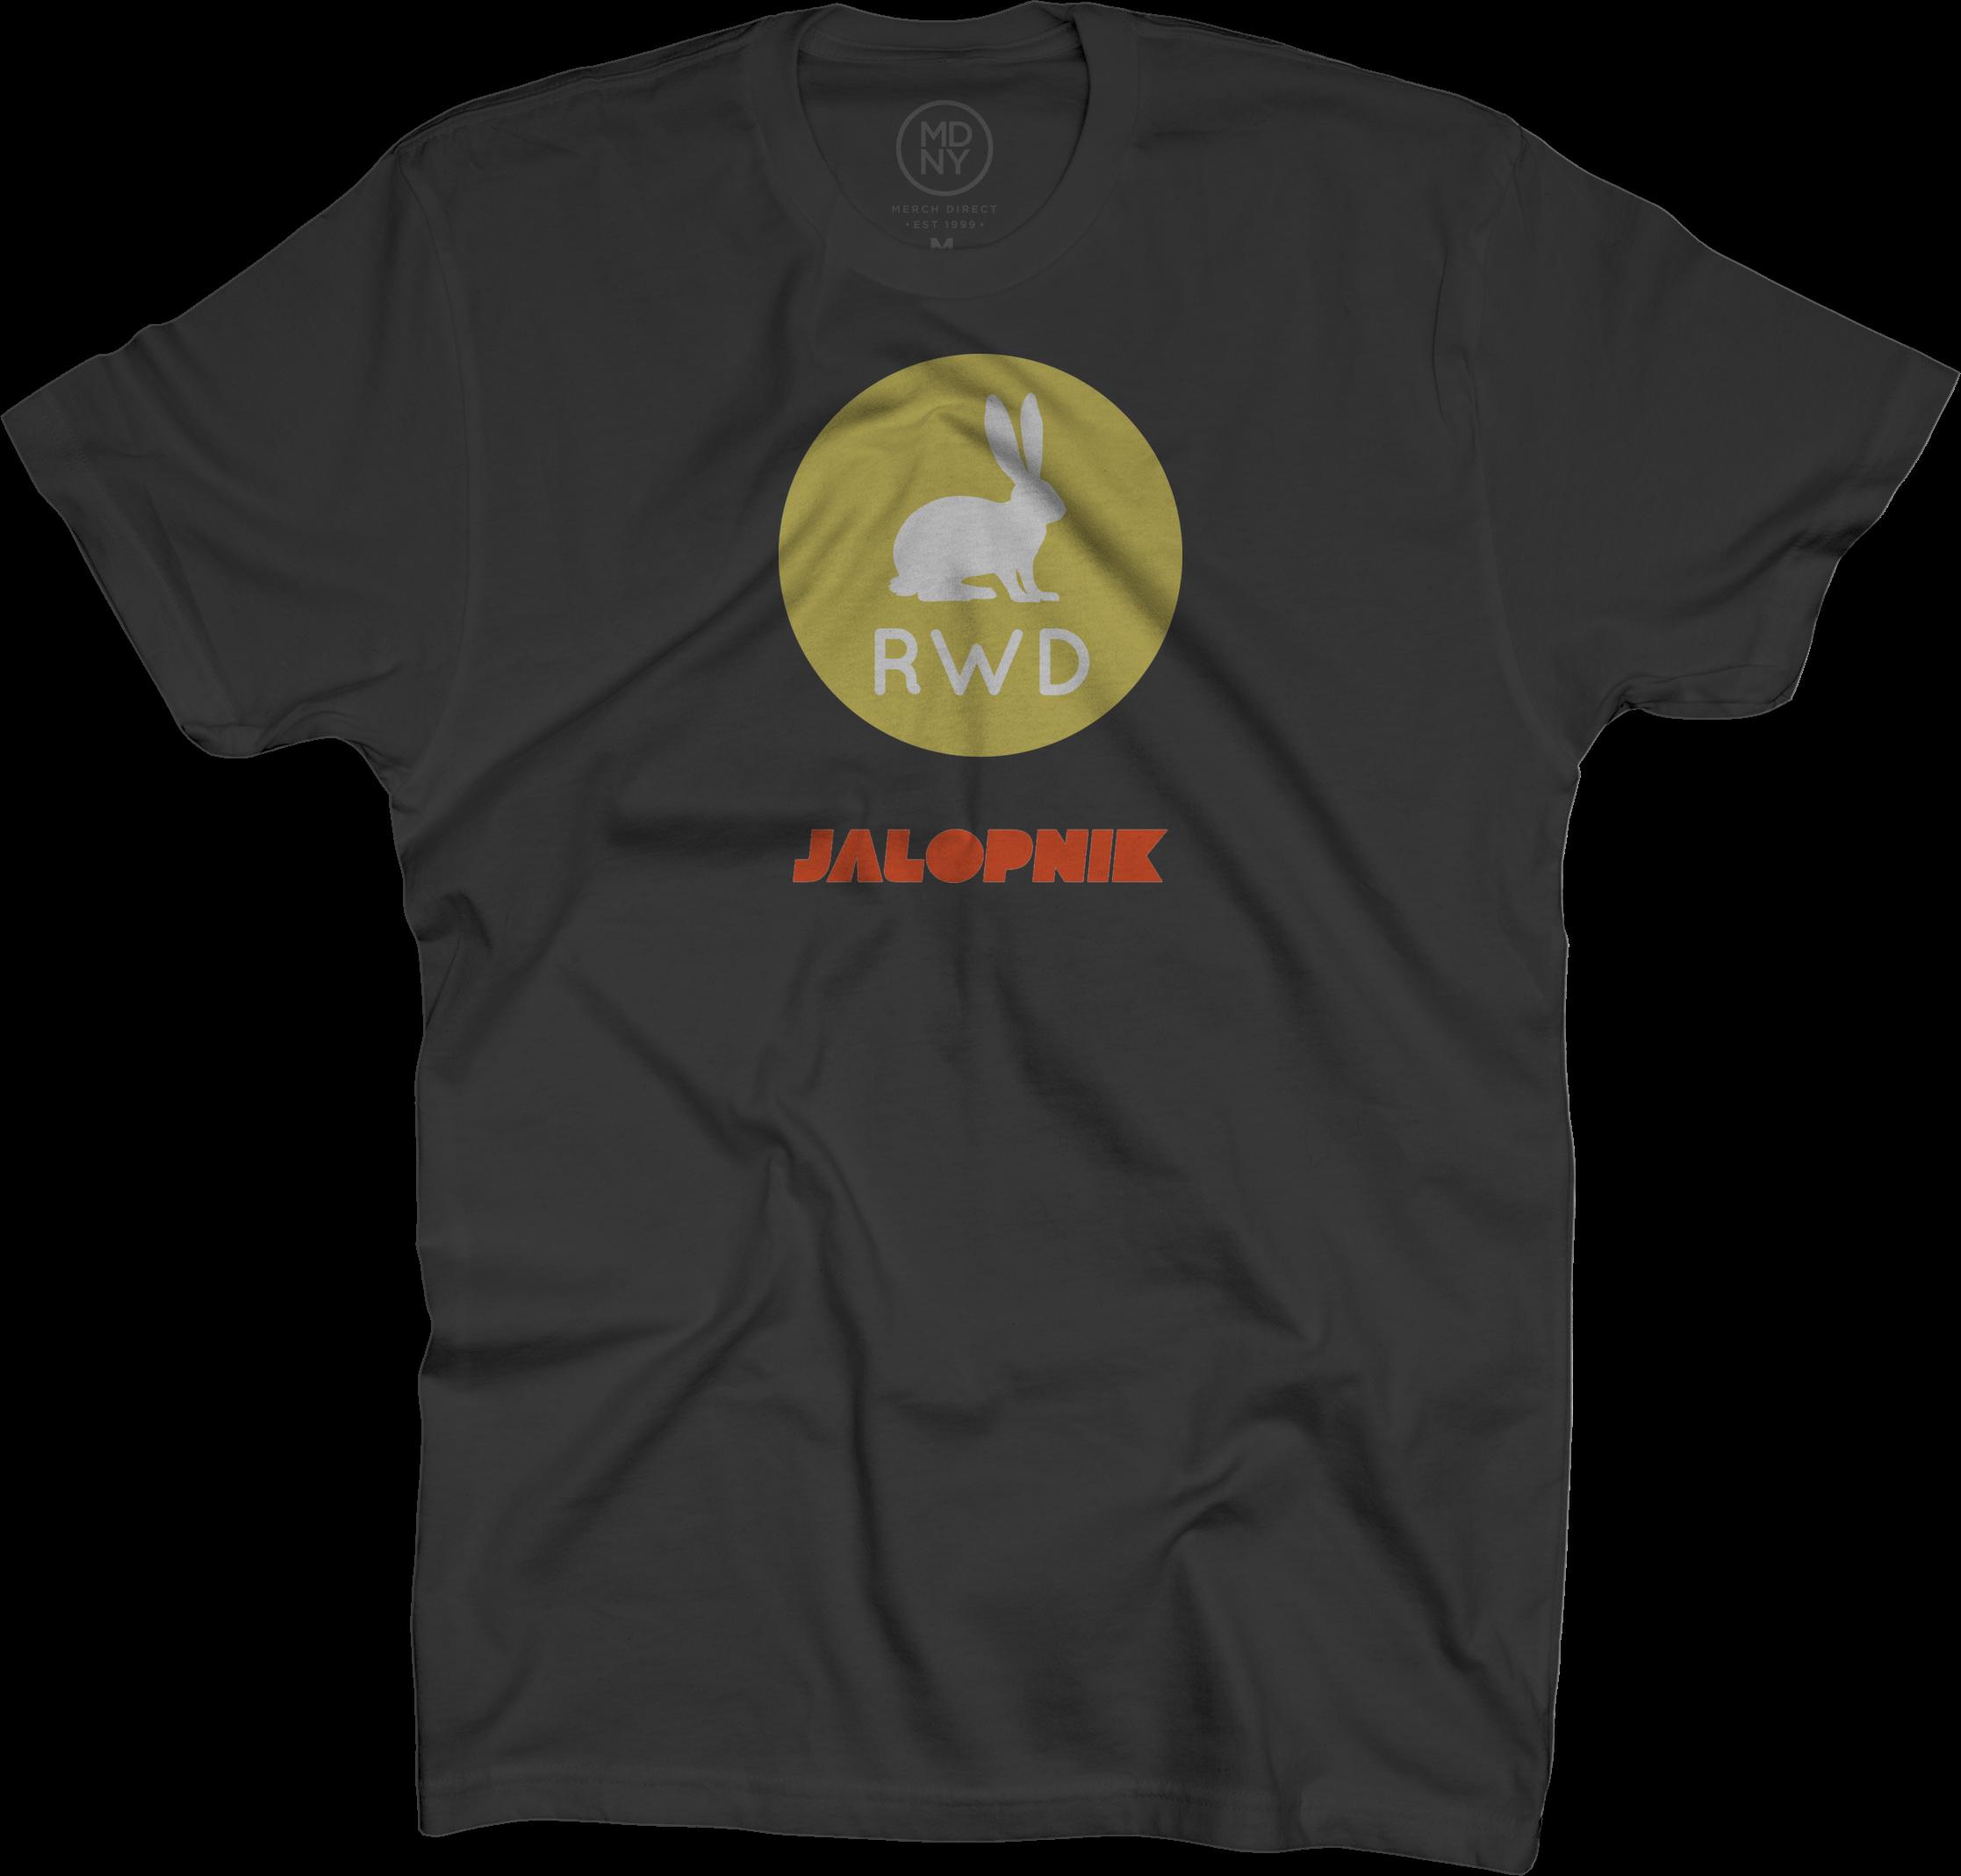 RWD Black T-Shirt